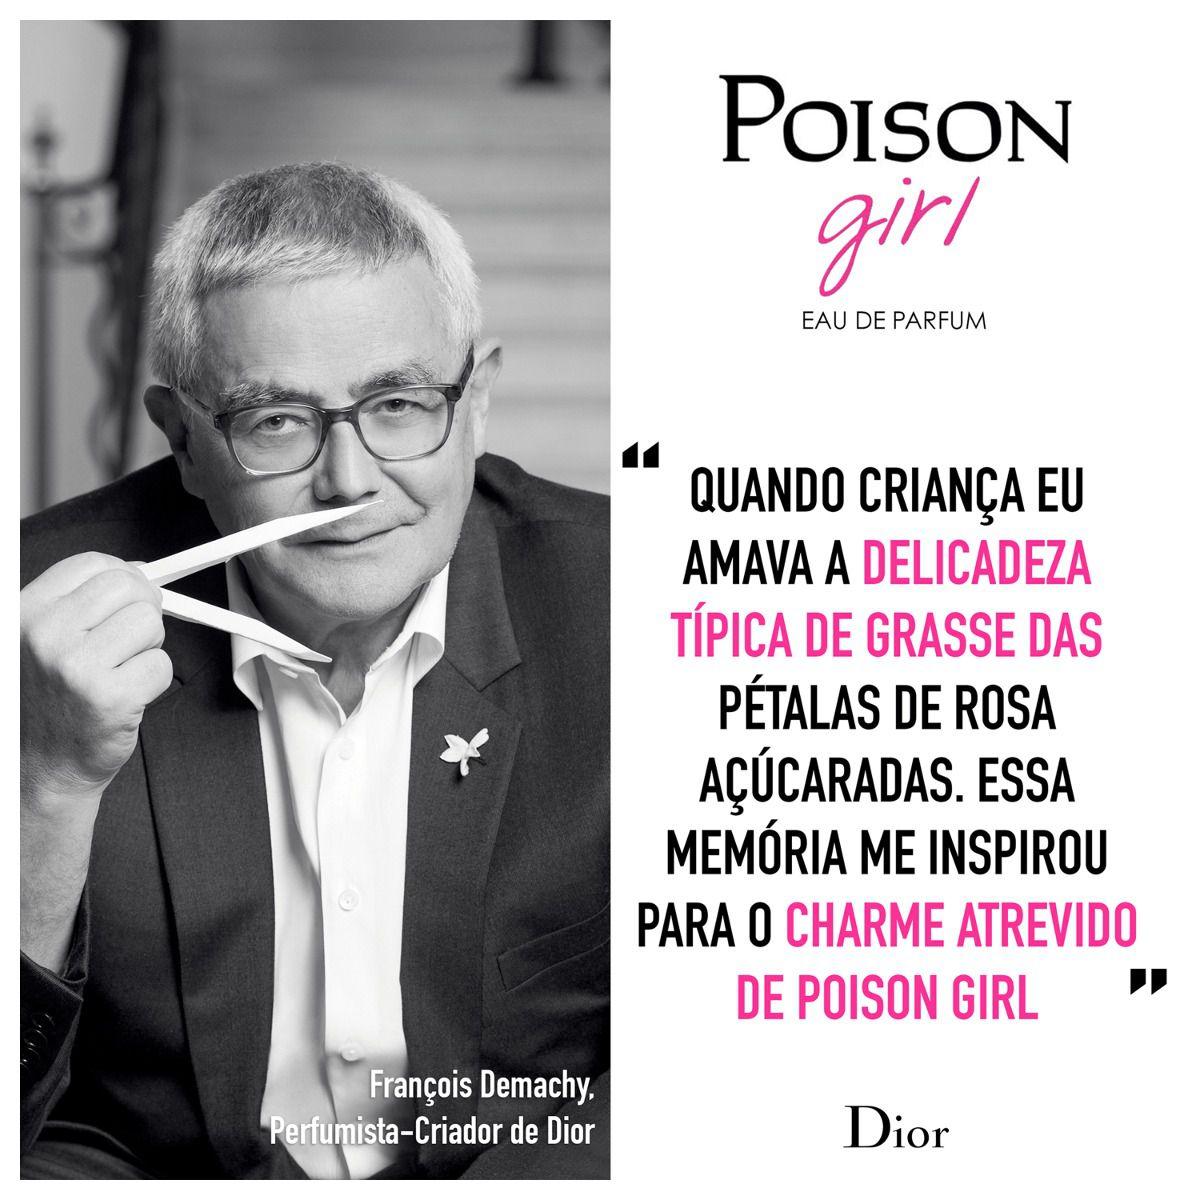 Poison Girl Dior - Perfume Feminino Eau de Toilette 30ml